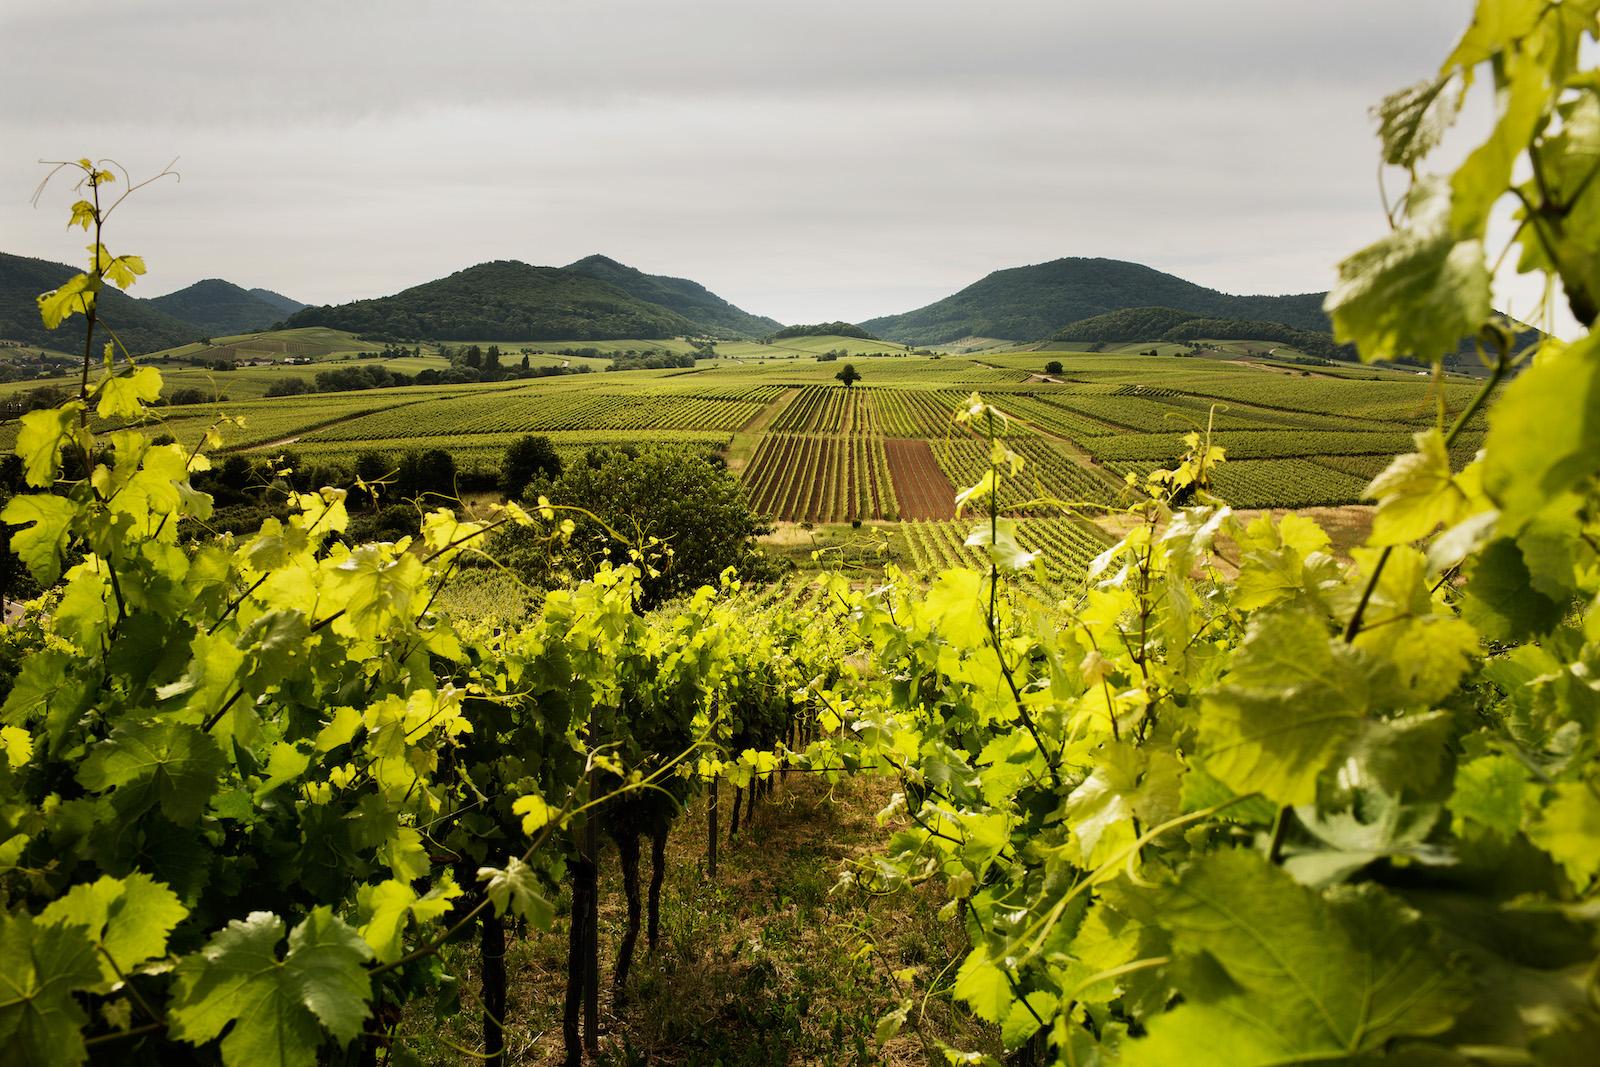 Das Weinanbaugebiet Pfalz